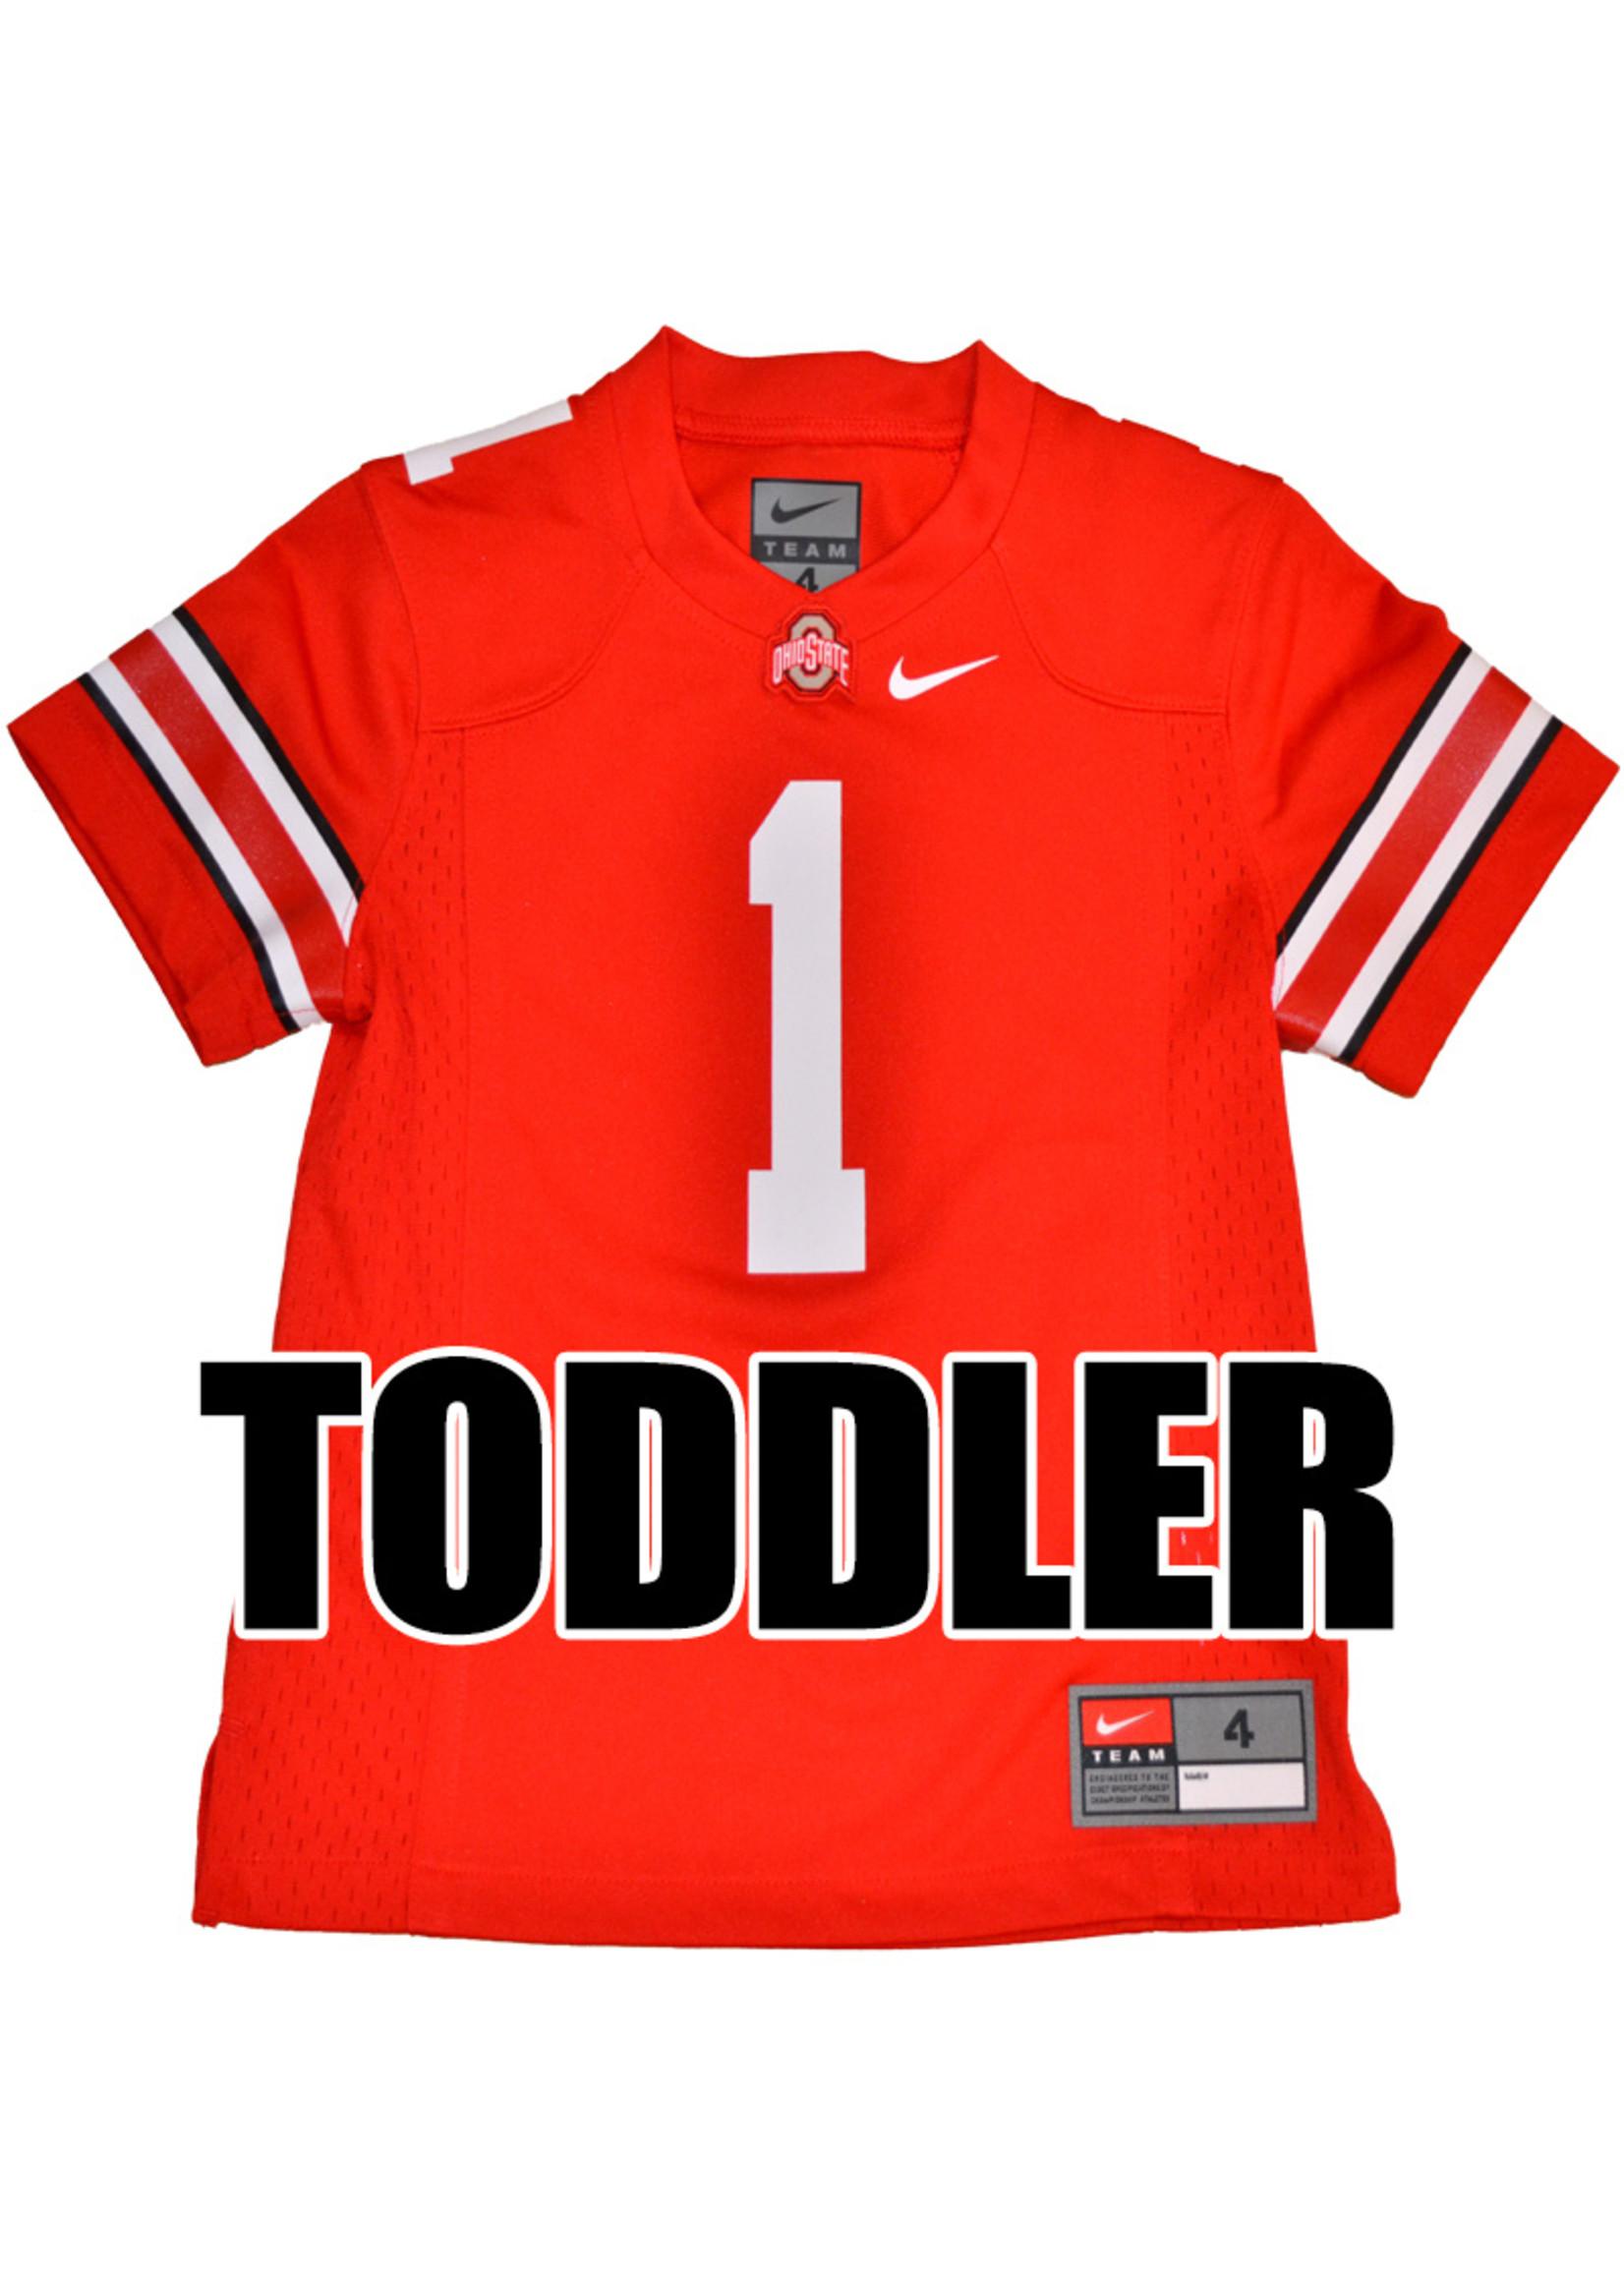 Nike Ohio State University Toddler #1 Nike Replica Jersey